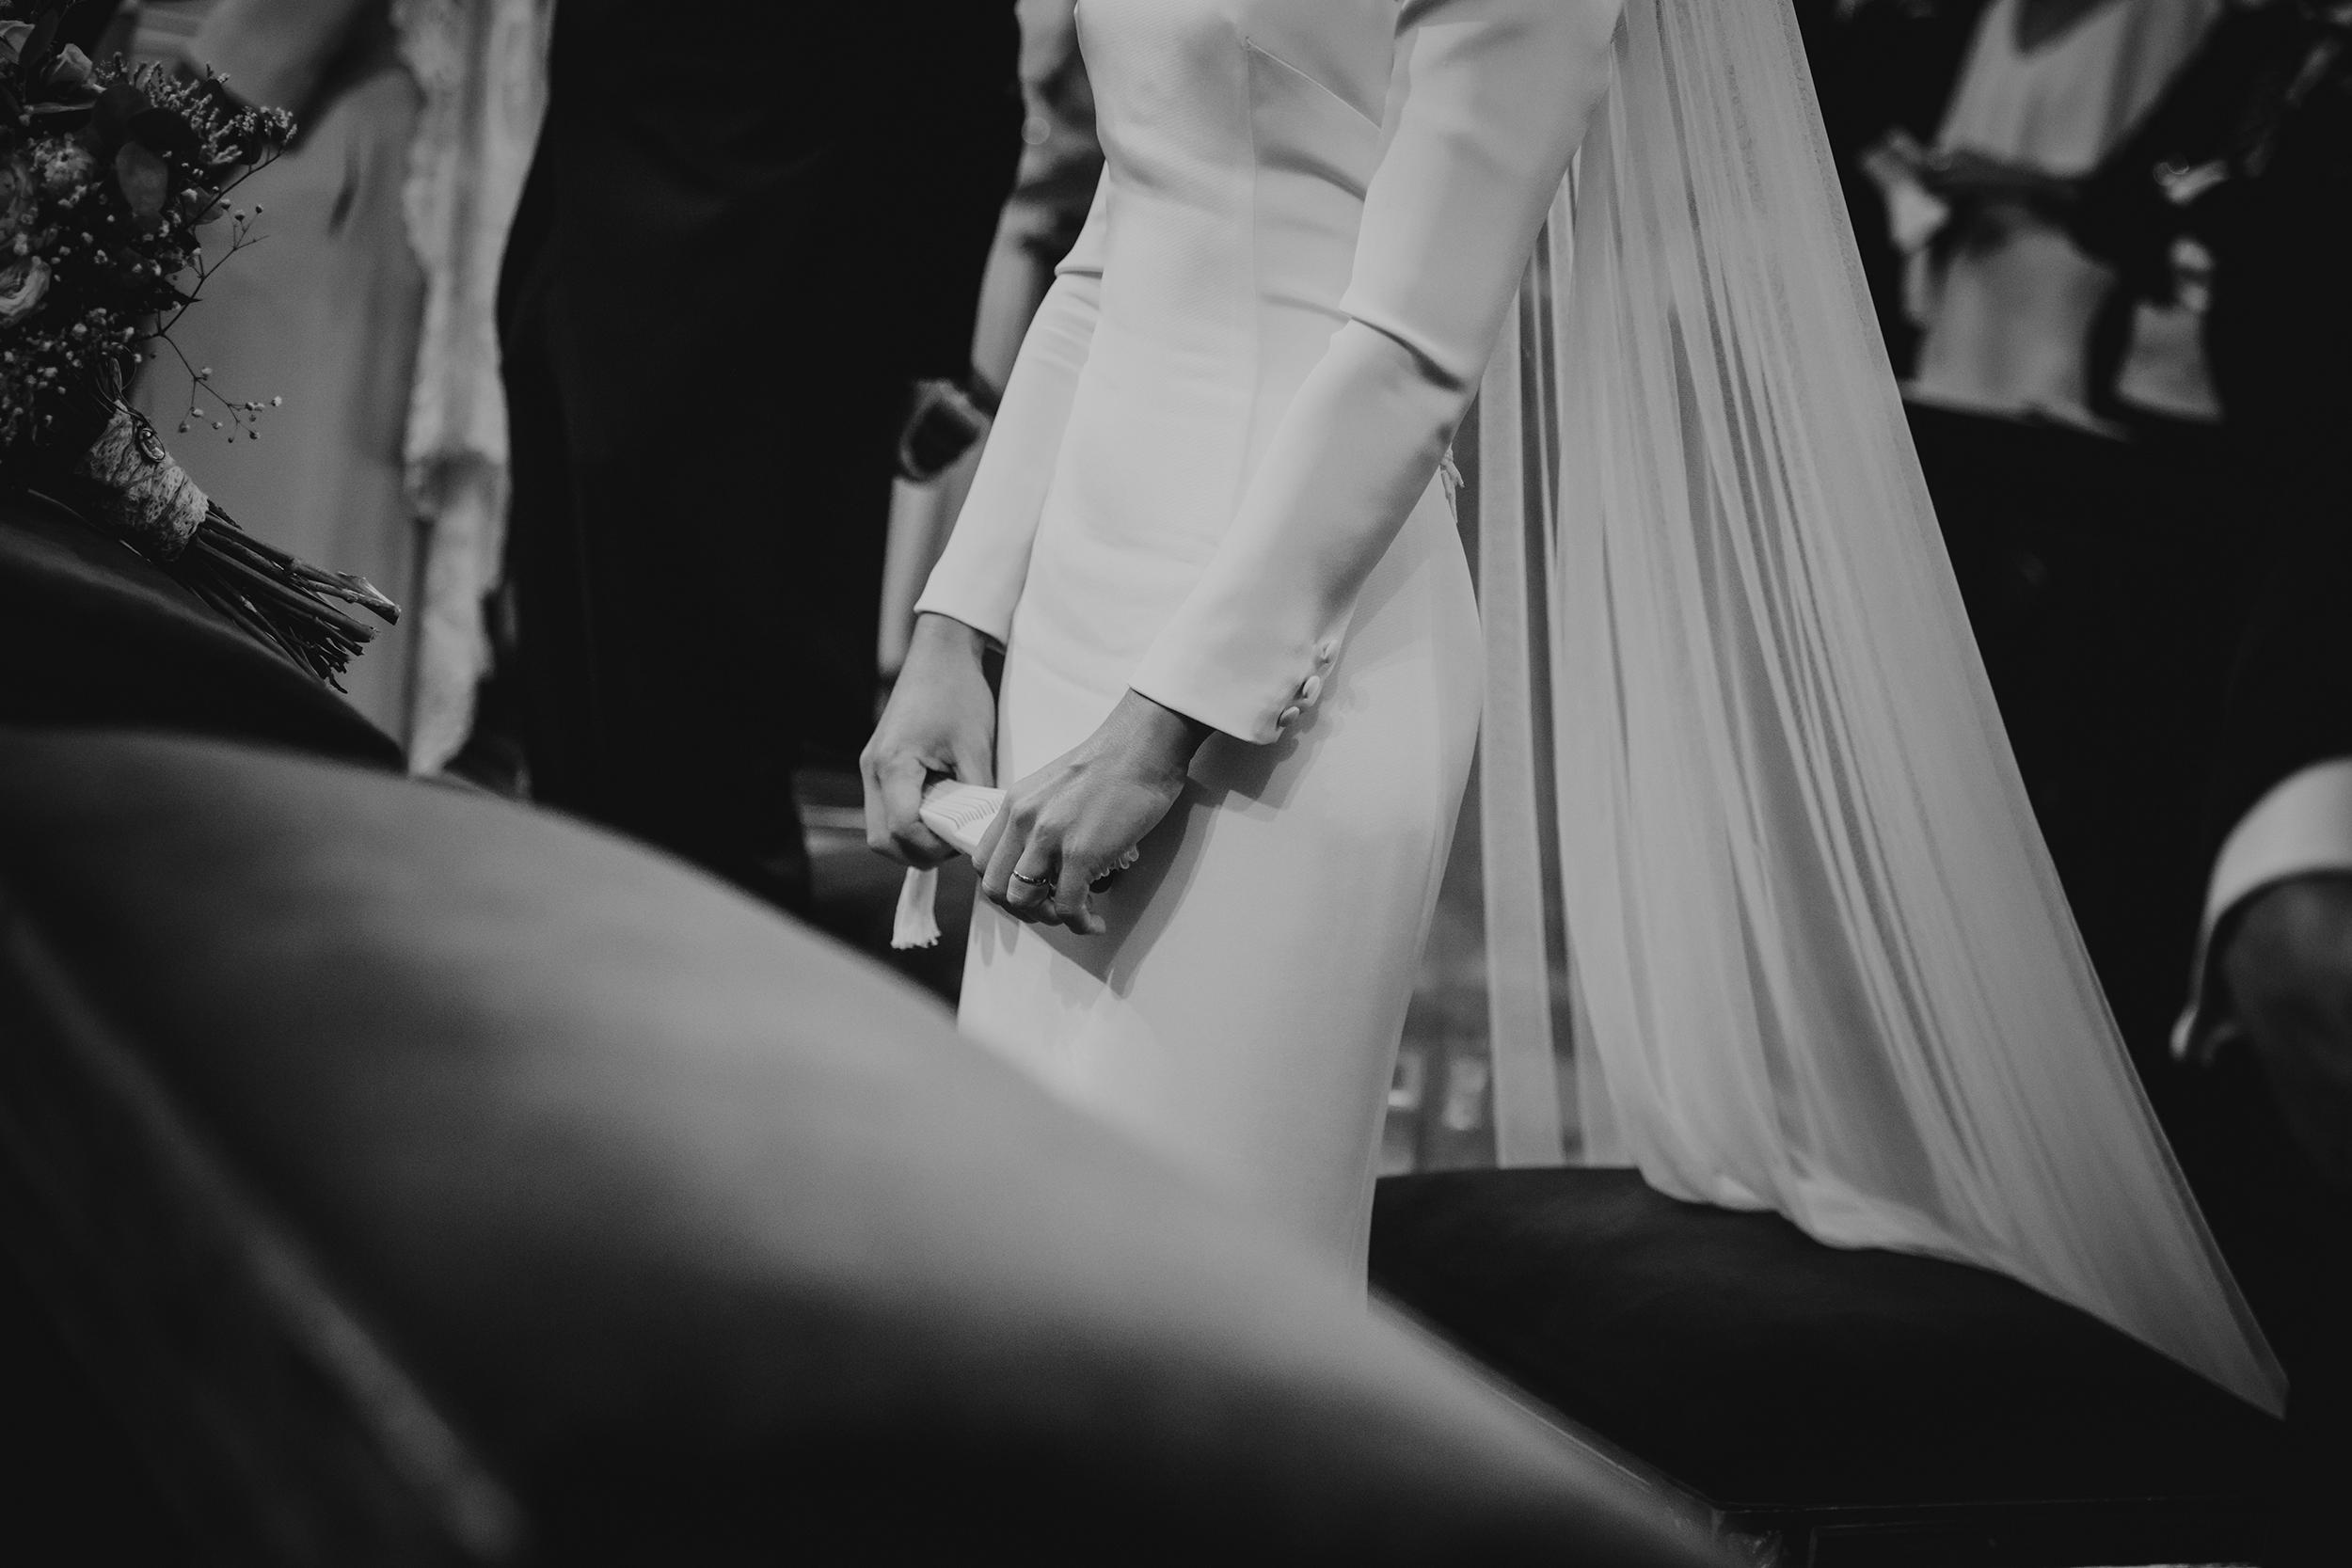 fotografo-bodas-granada-catedral-sagrario-jose-reyes_044.jpg